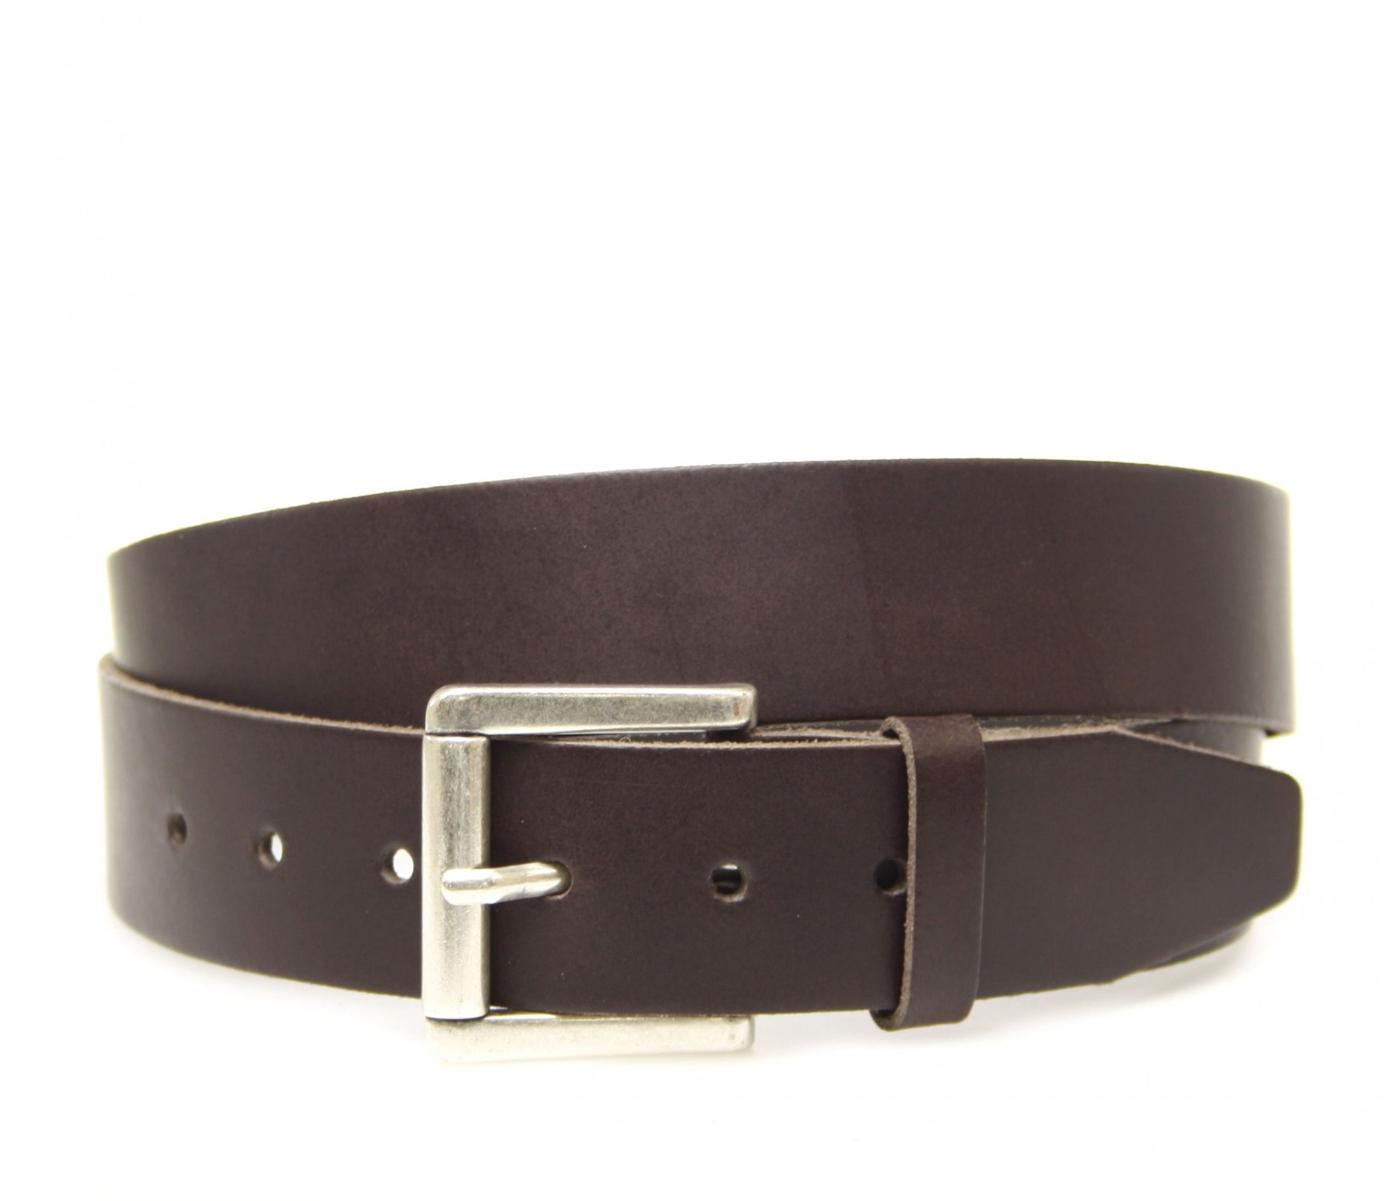 Vanzetti V4422-691 leather belt extra long - dark brown